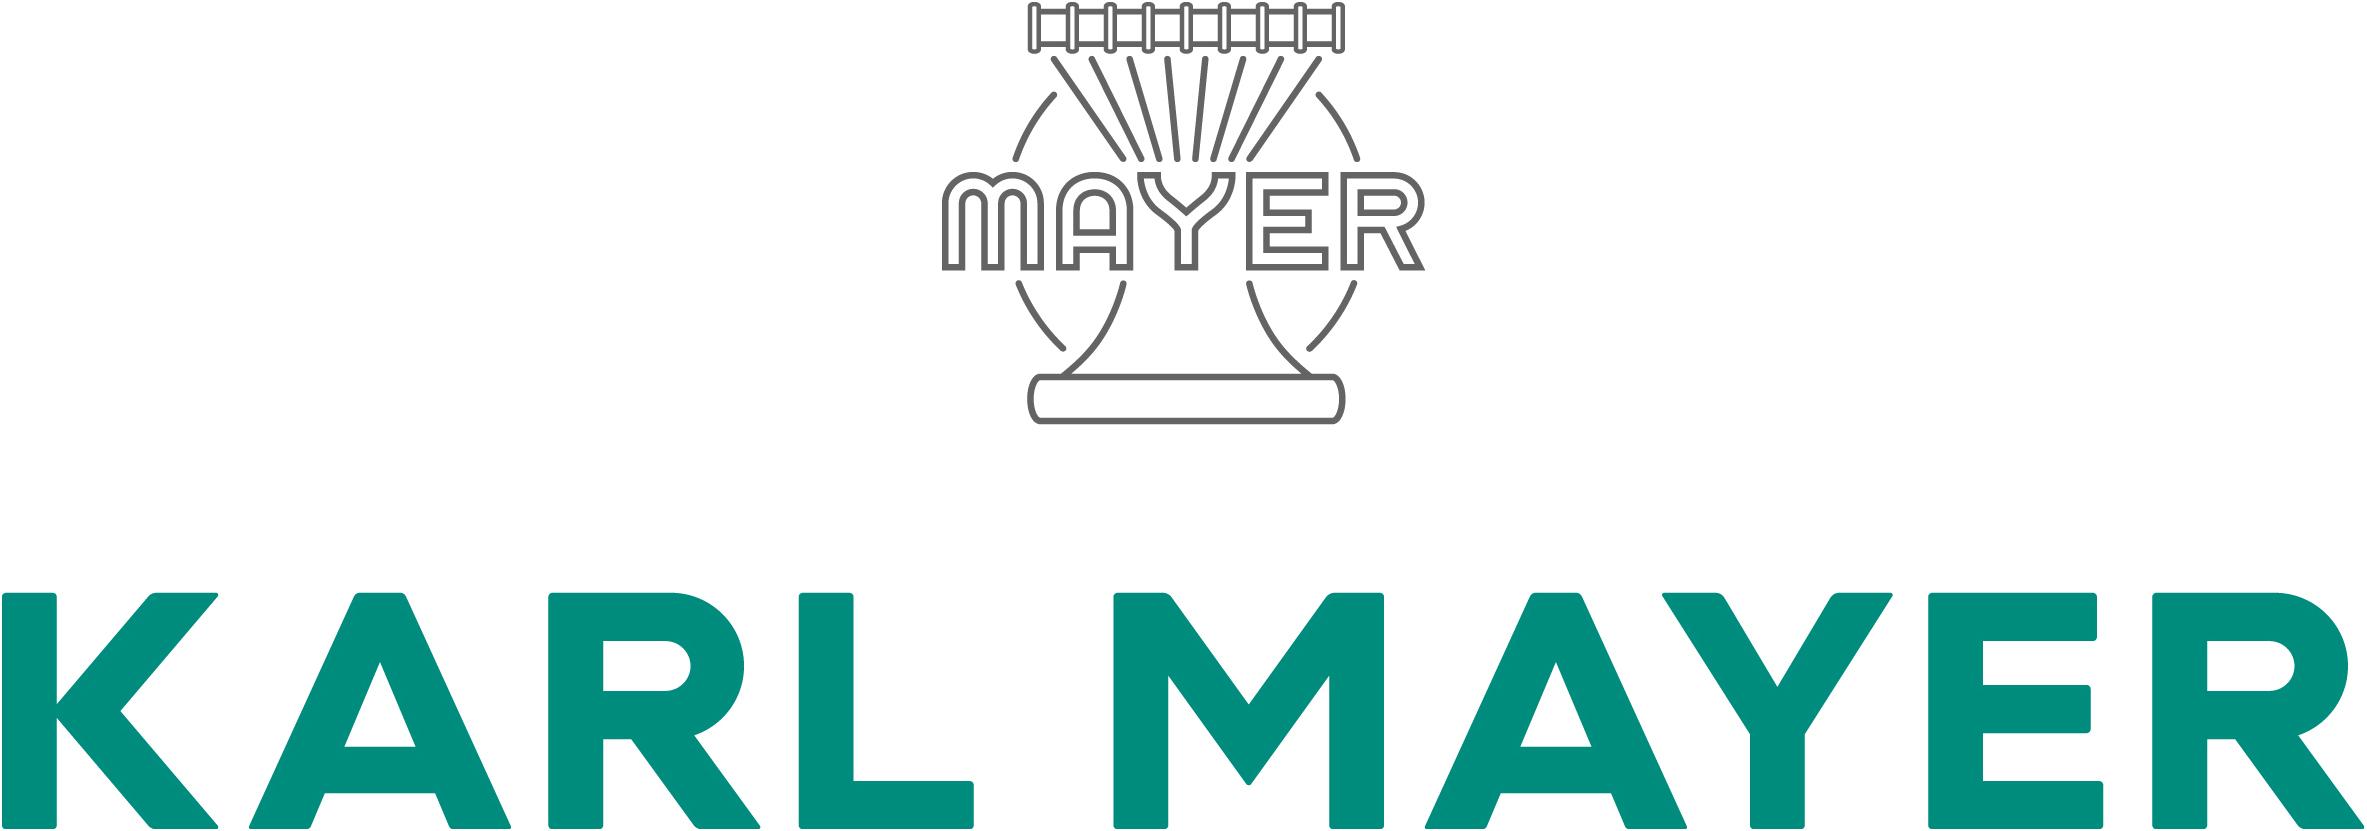 KARL_MAYER_Logo_without_Claim_colour_sRGB.JPG